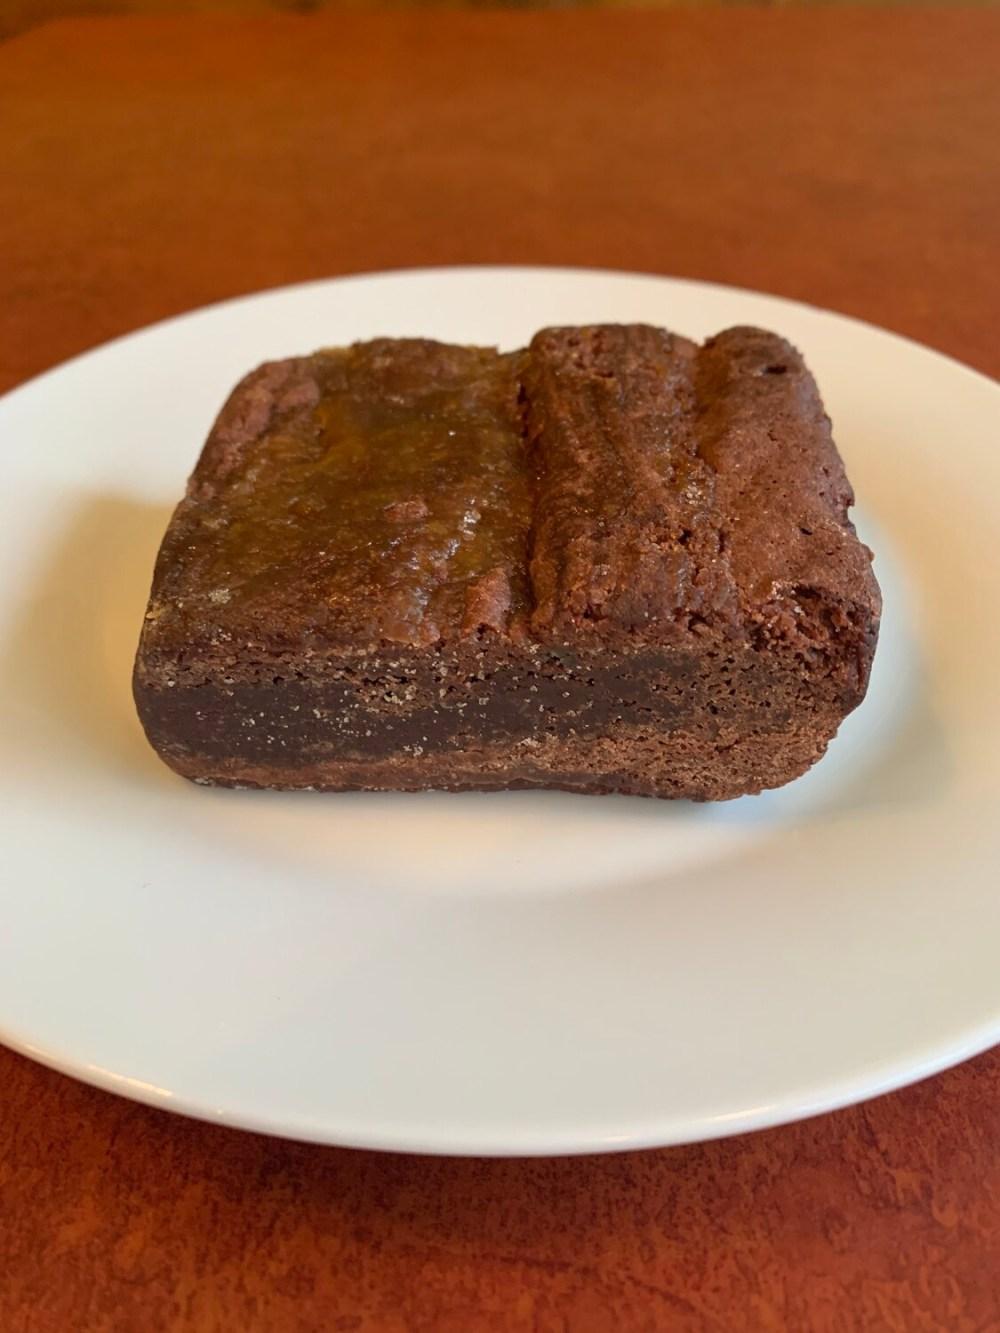 Mindful Baking Caramel Sea Salt Brownie (gf)